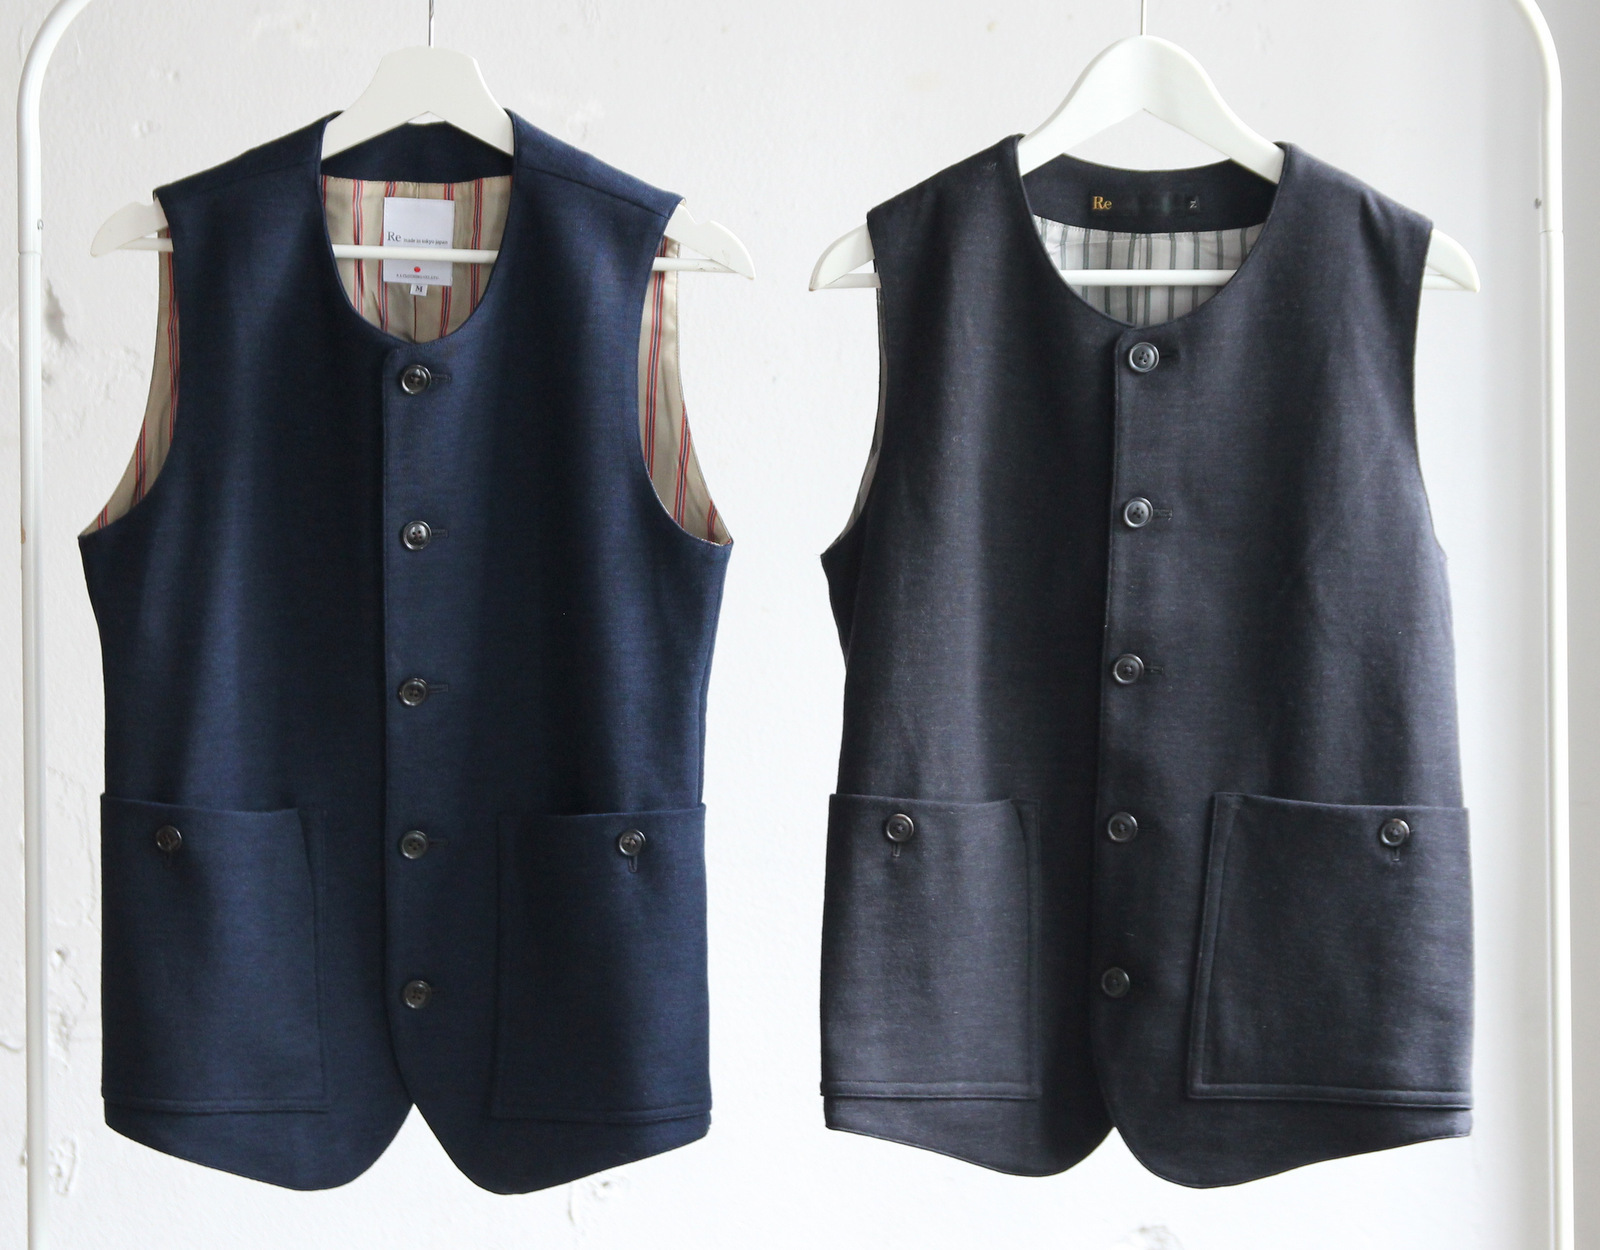 Dress Wool Knit Tailor Vest_c0379477_20101157.jpg